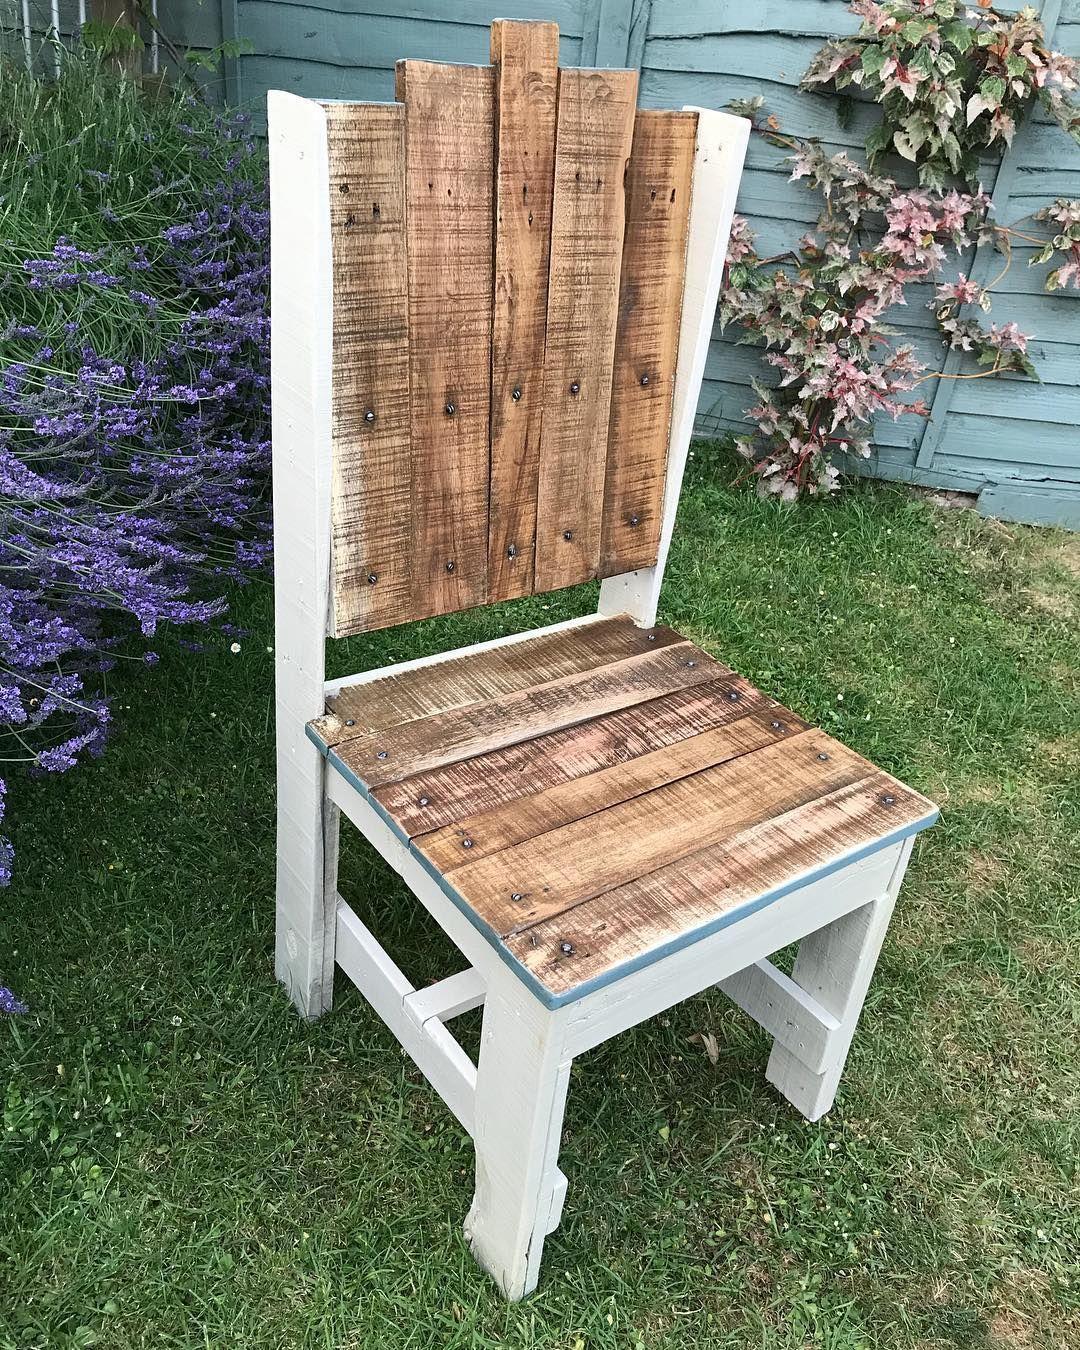 Diy recycled wooden pallet garden chair decor ideas